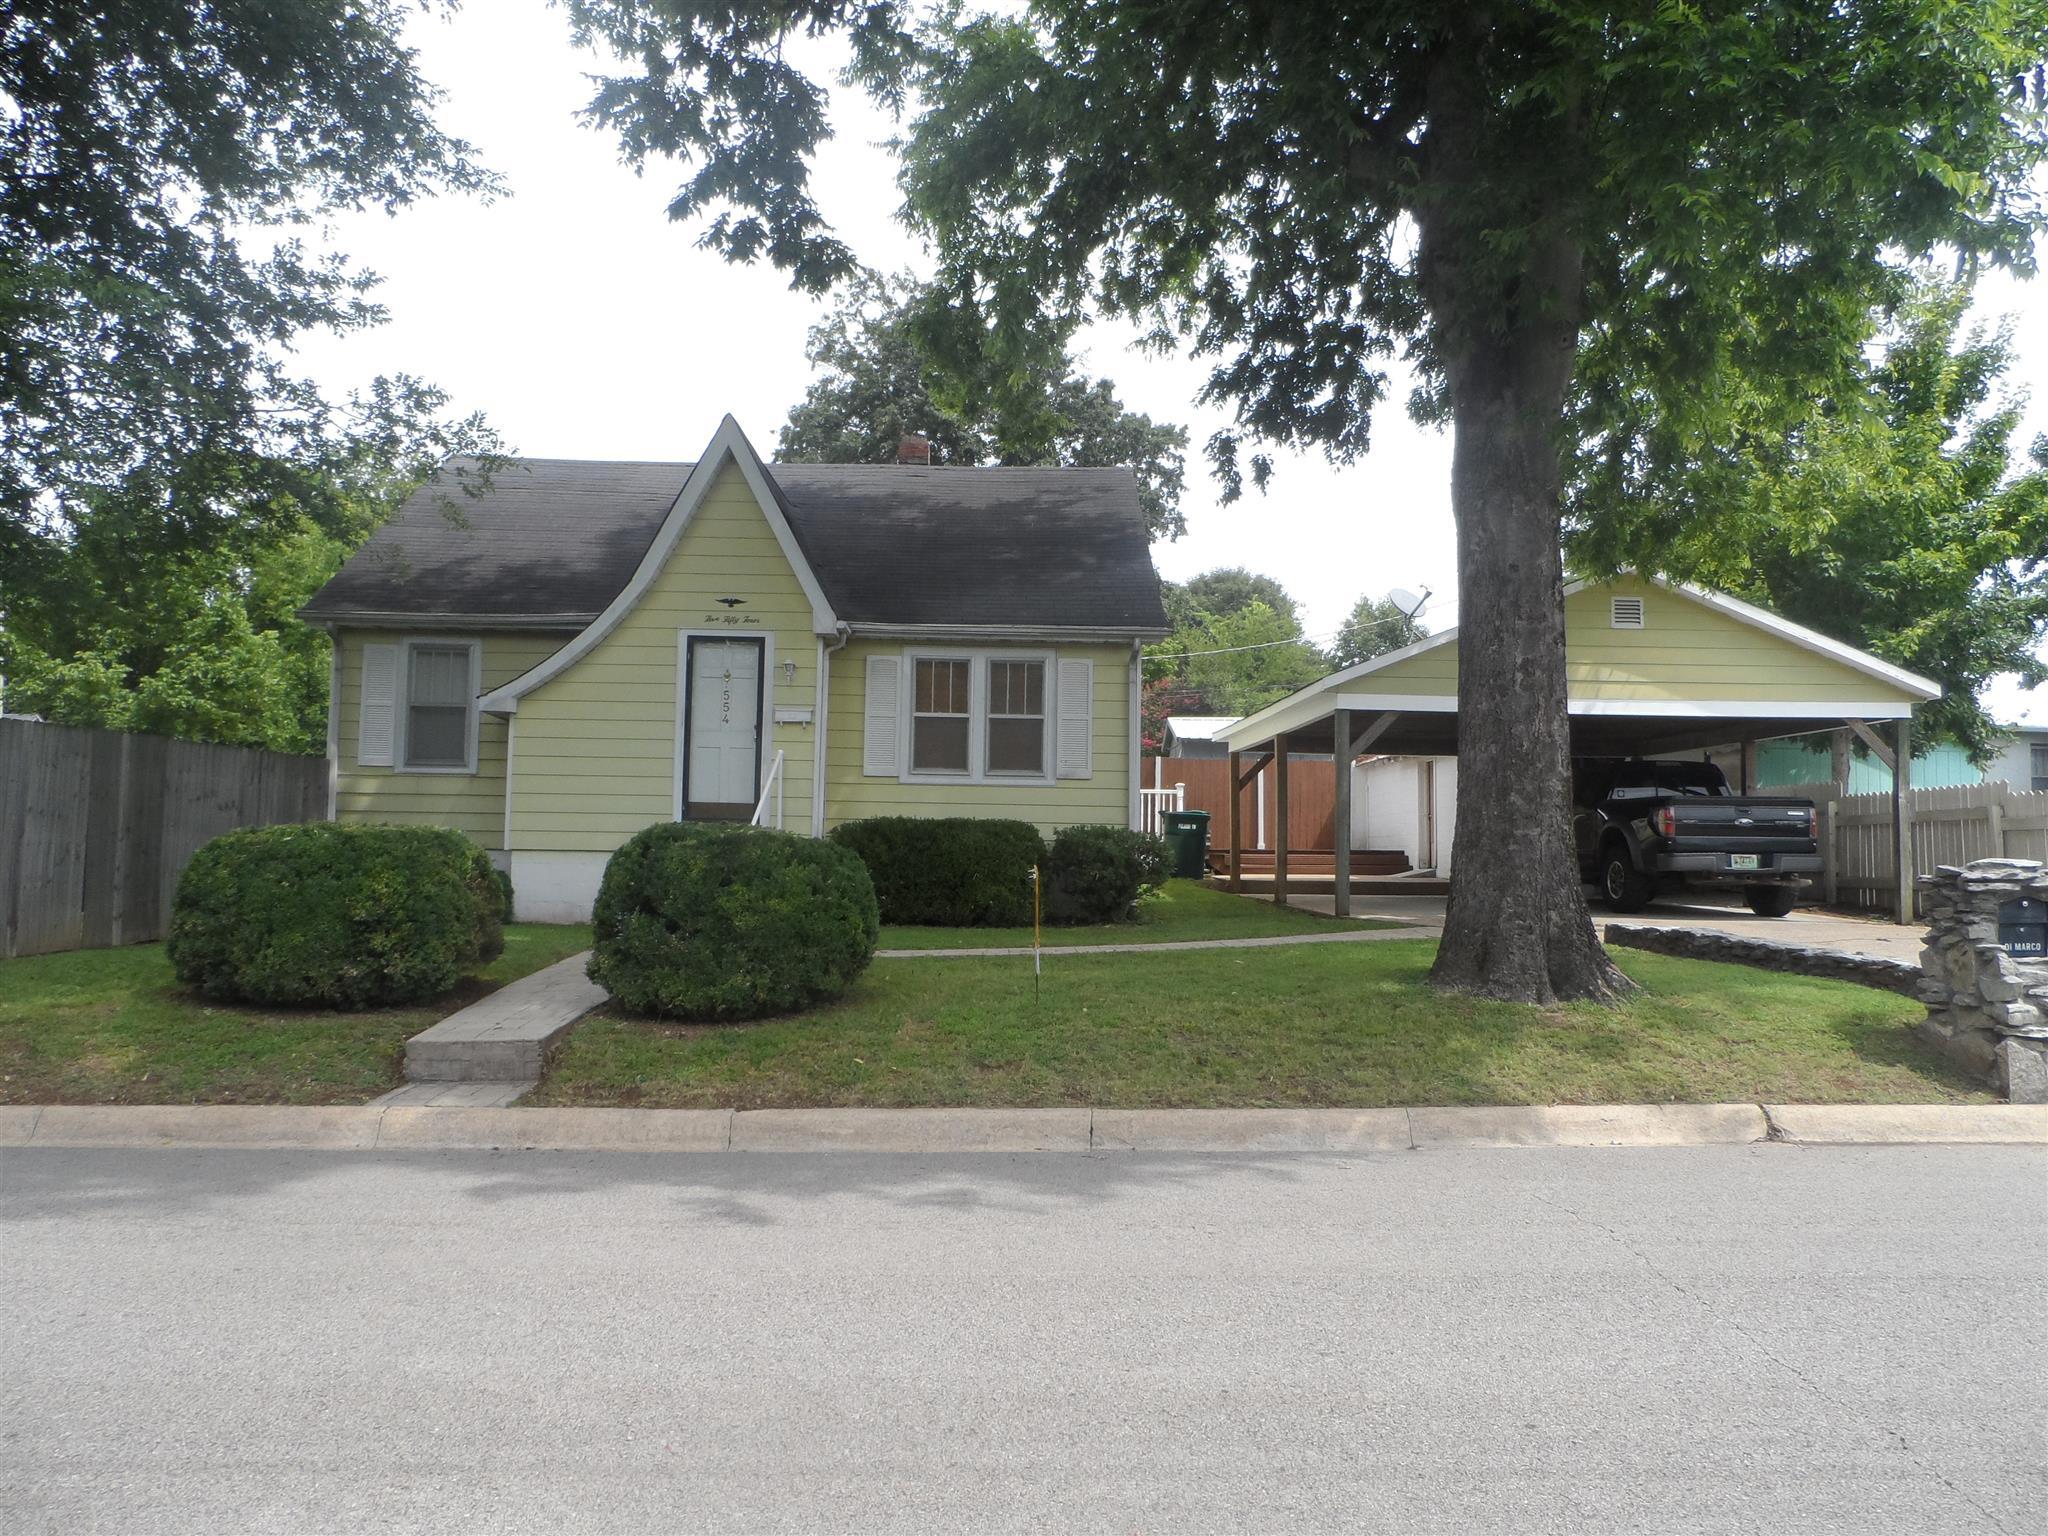 554 Highland Ave, Pulaski, TN 38478 - Pulaski, TN real estate listing